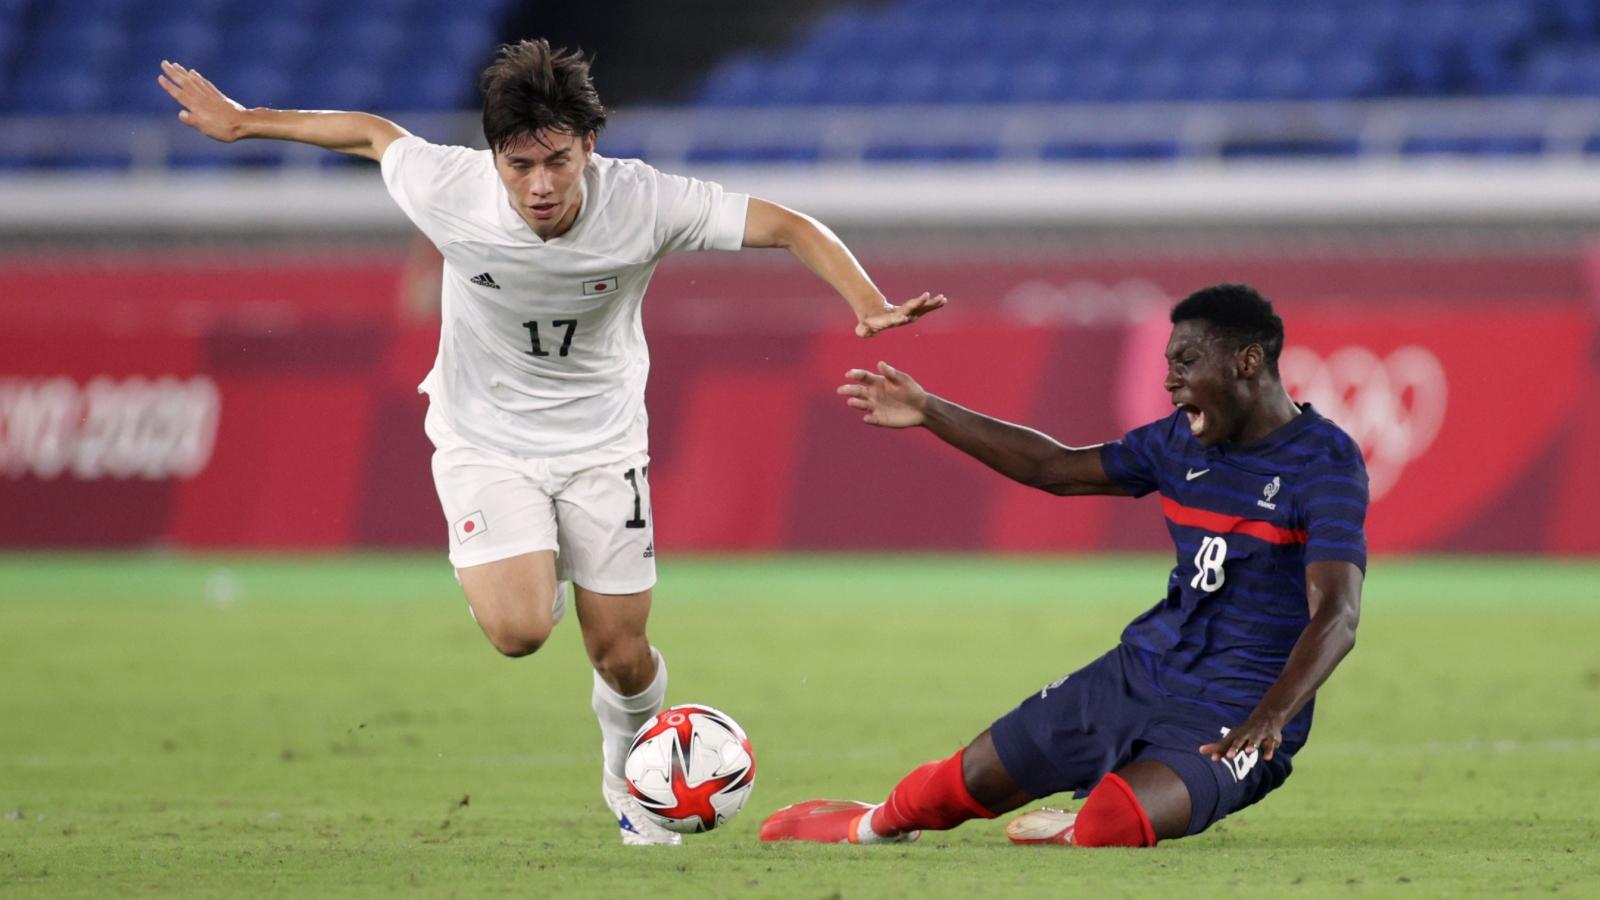 Trực tiếp Pháp 0-2 Nhật Bản: Kubo, Sakai rực sáng